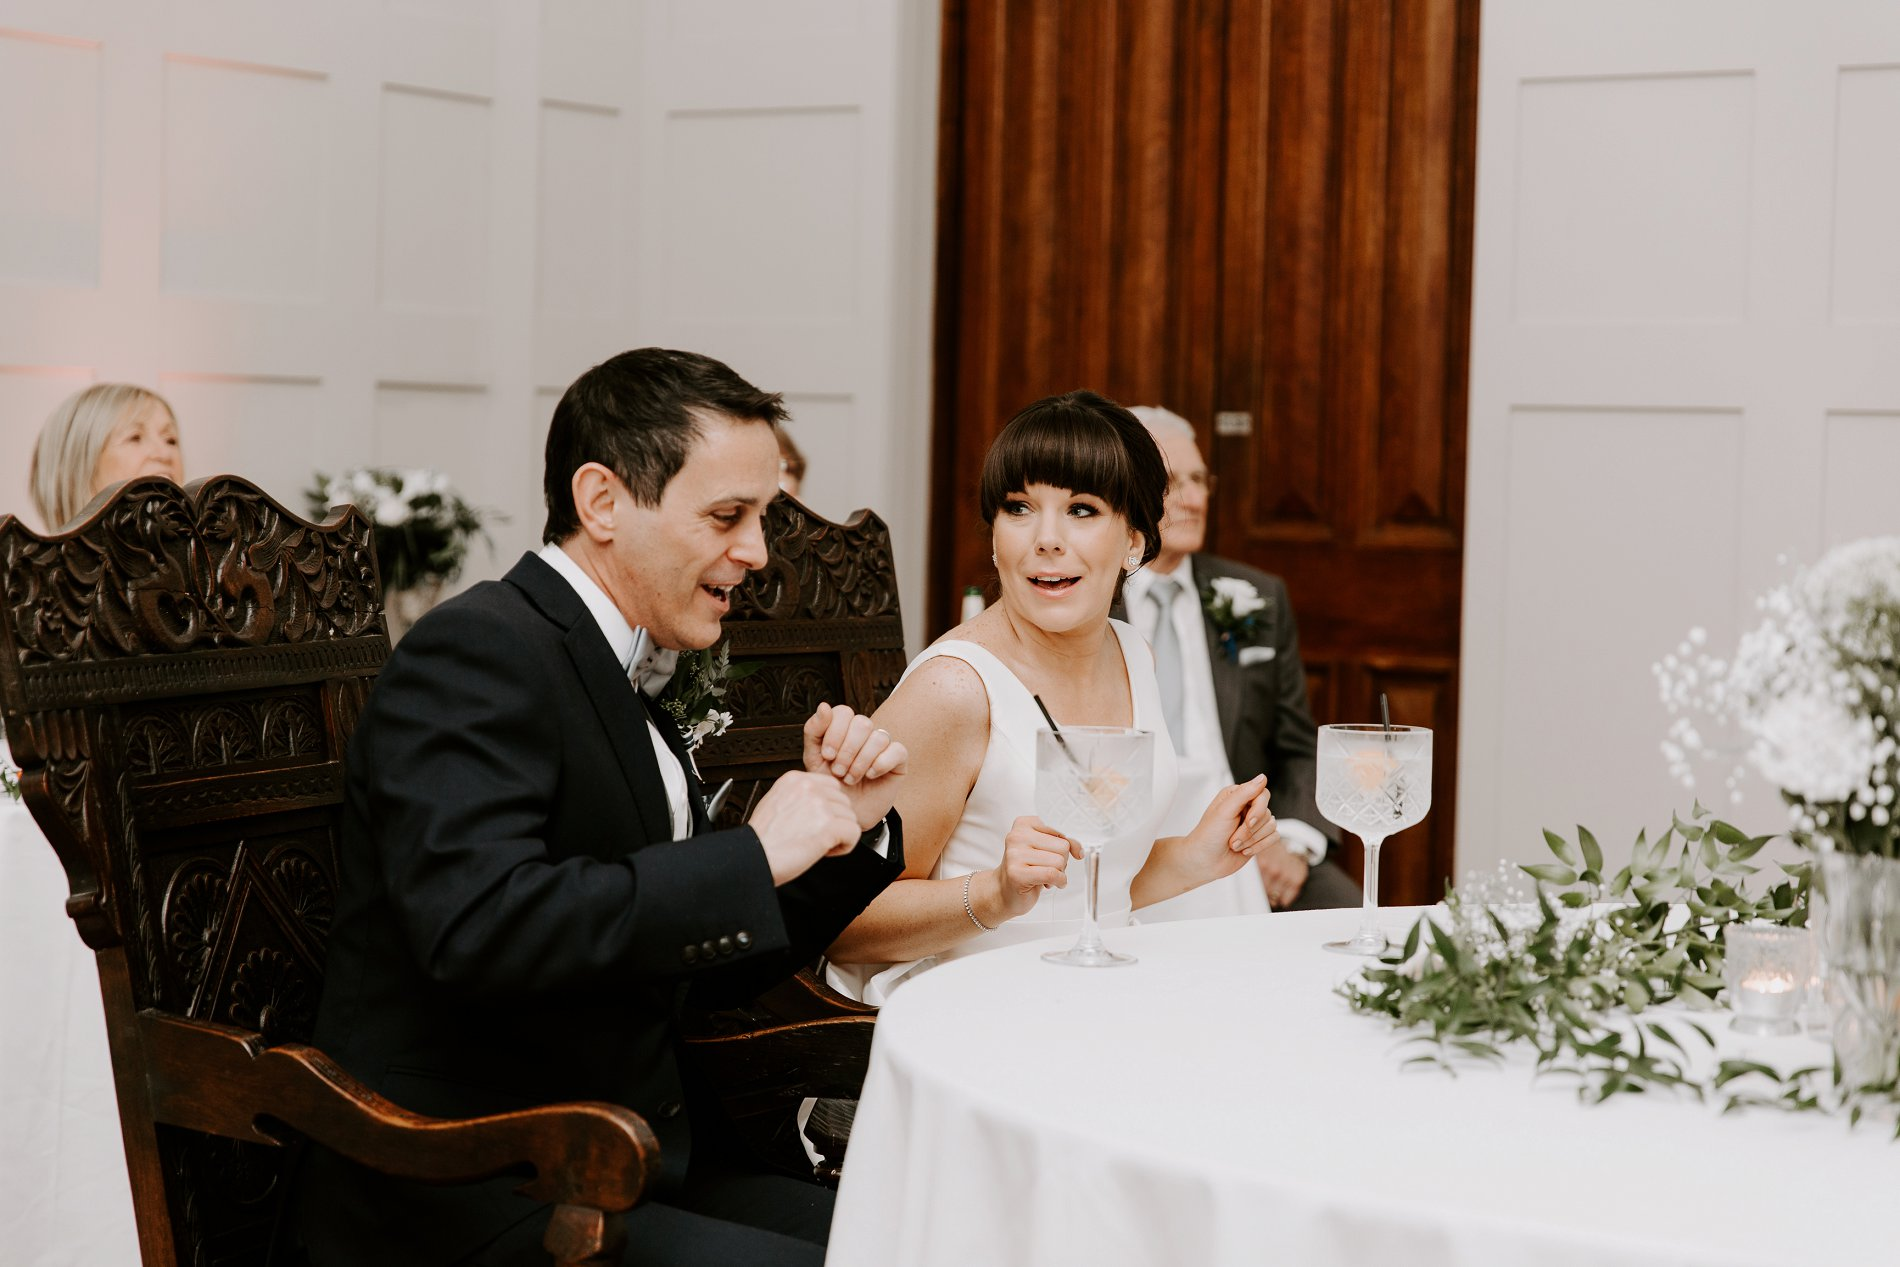 An Elegant White Wedding at Thicket Priory (c) Carla Whittingham Photography (96)